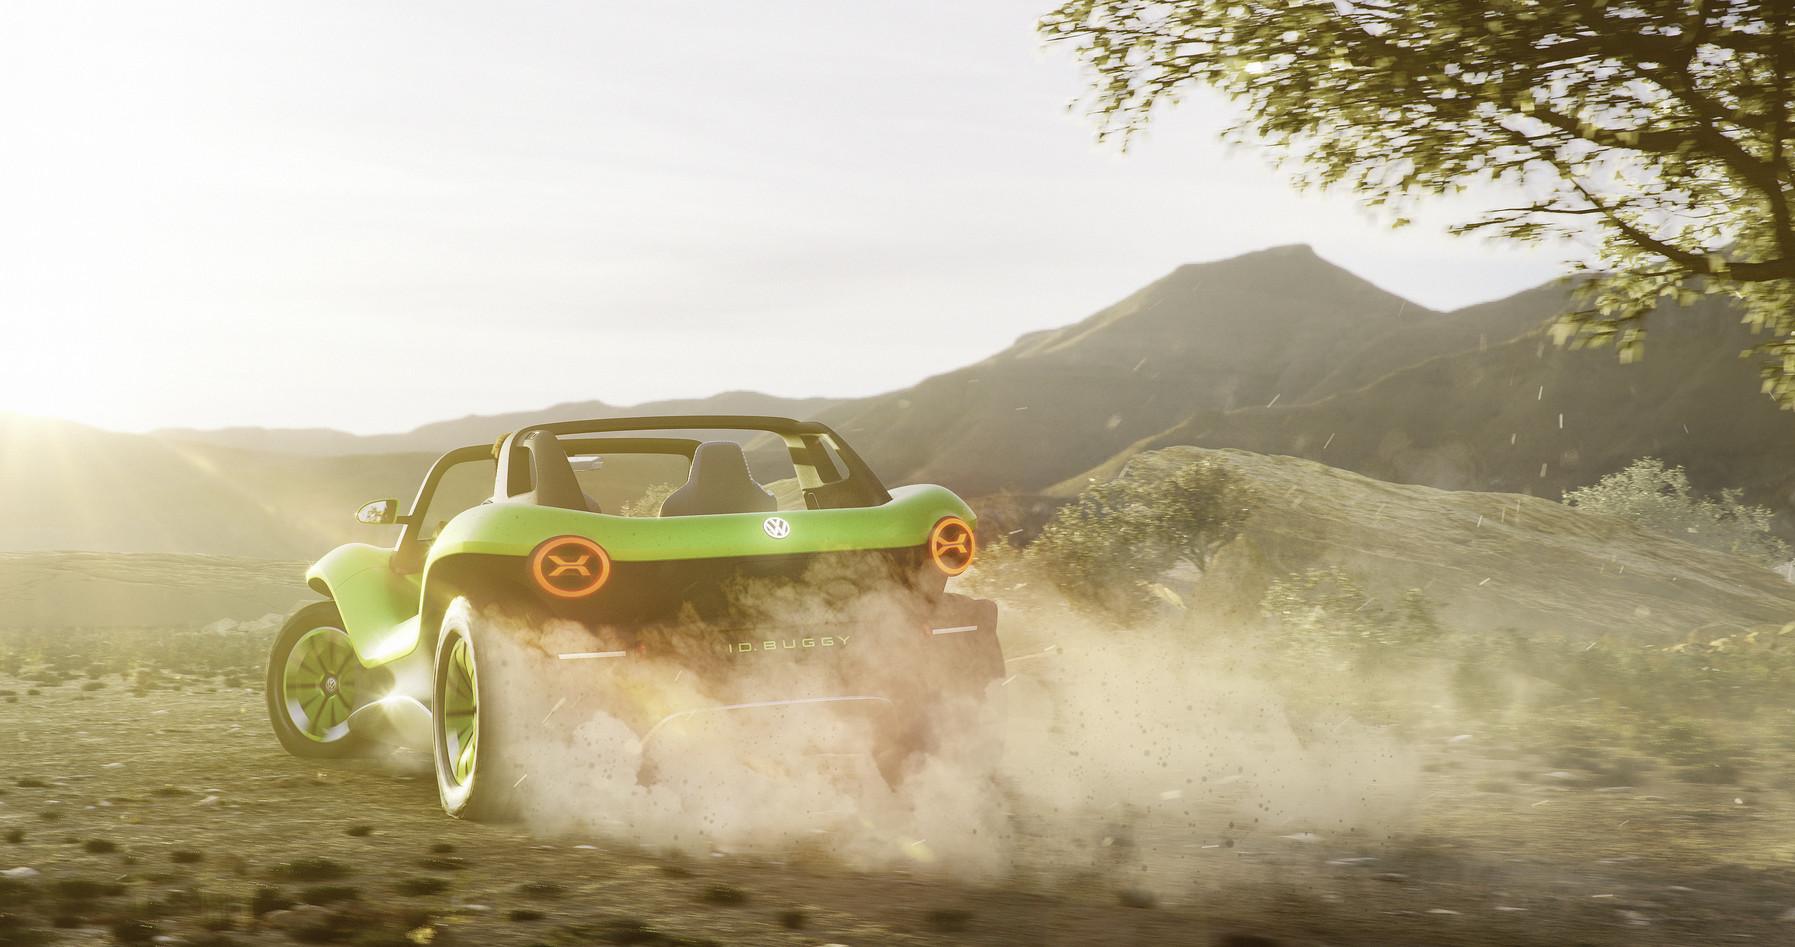 Volkswagen I.D. Buggy kicking up dirt